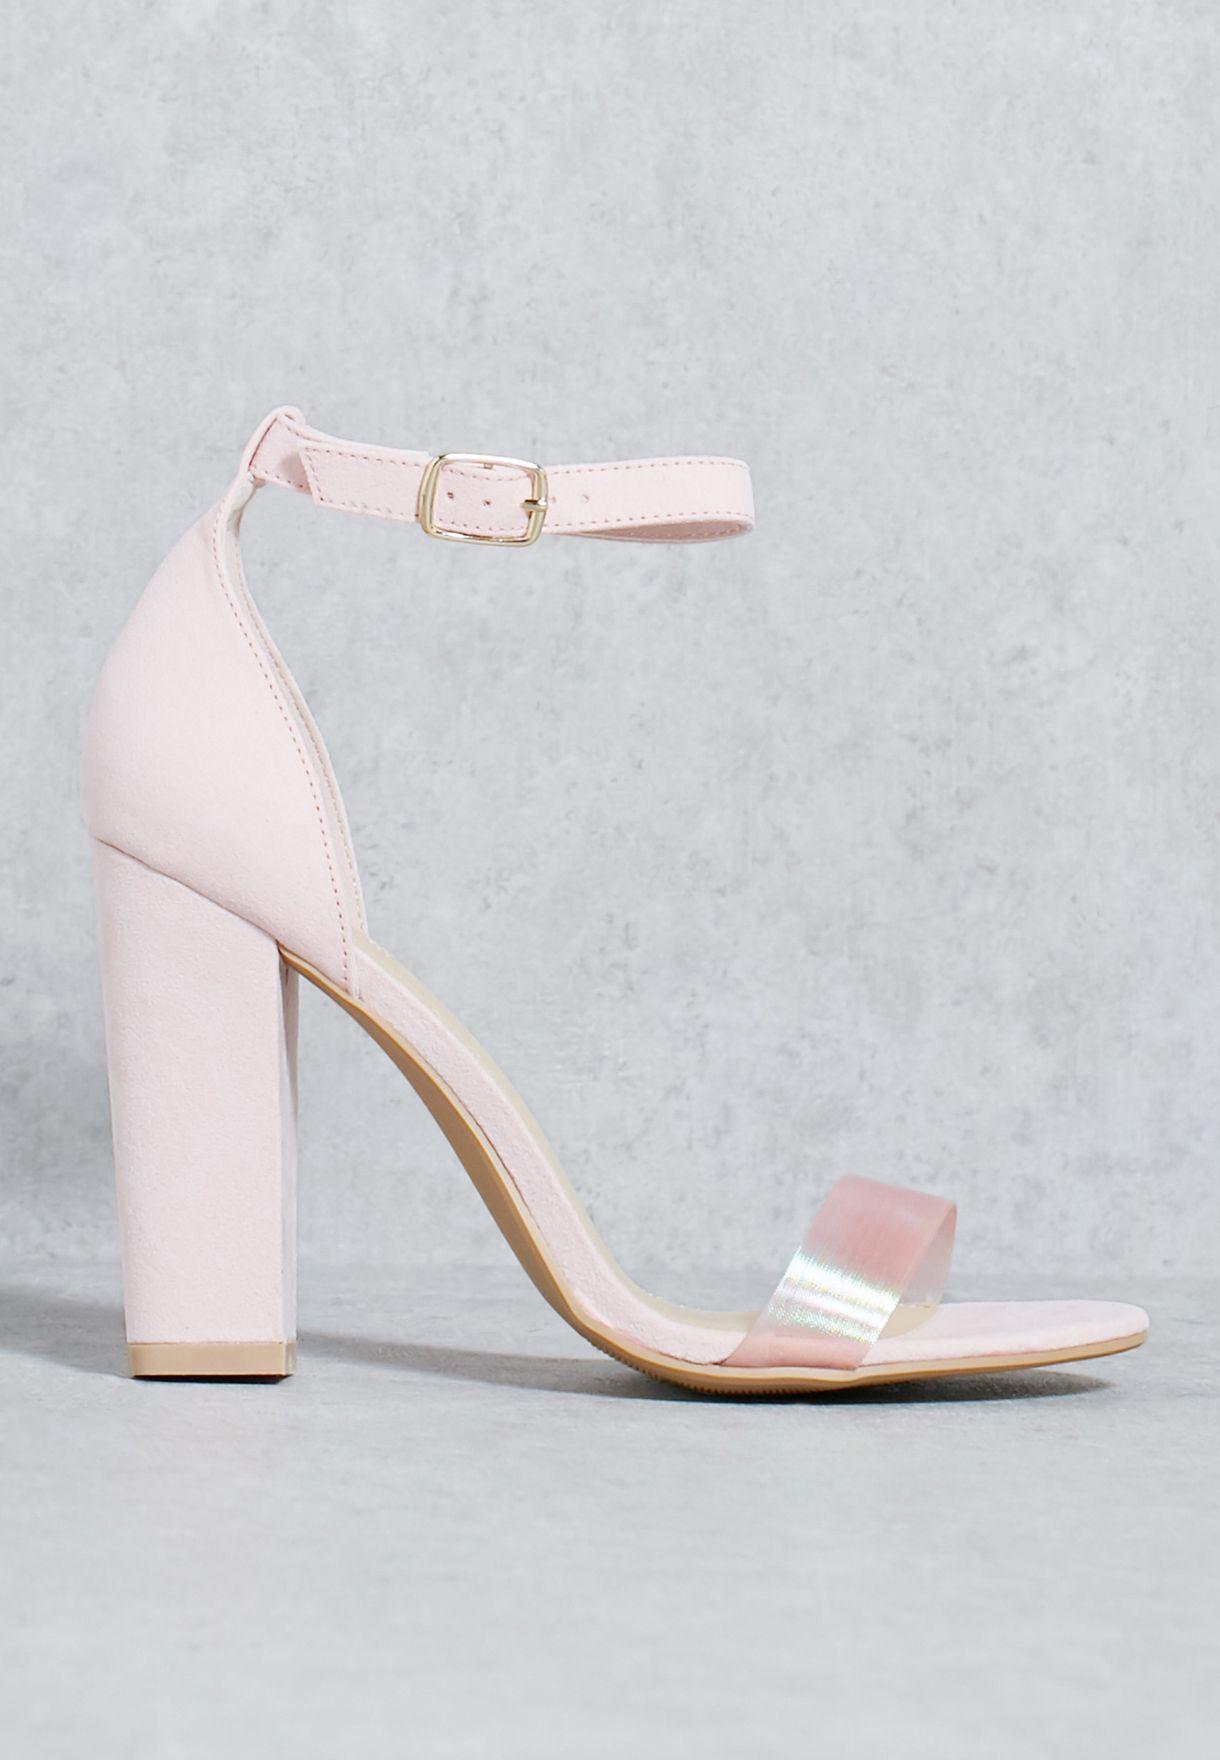 Forever 21 Women's Pumps Black Heel Shoe   Konga Online Shopping